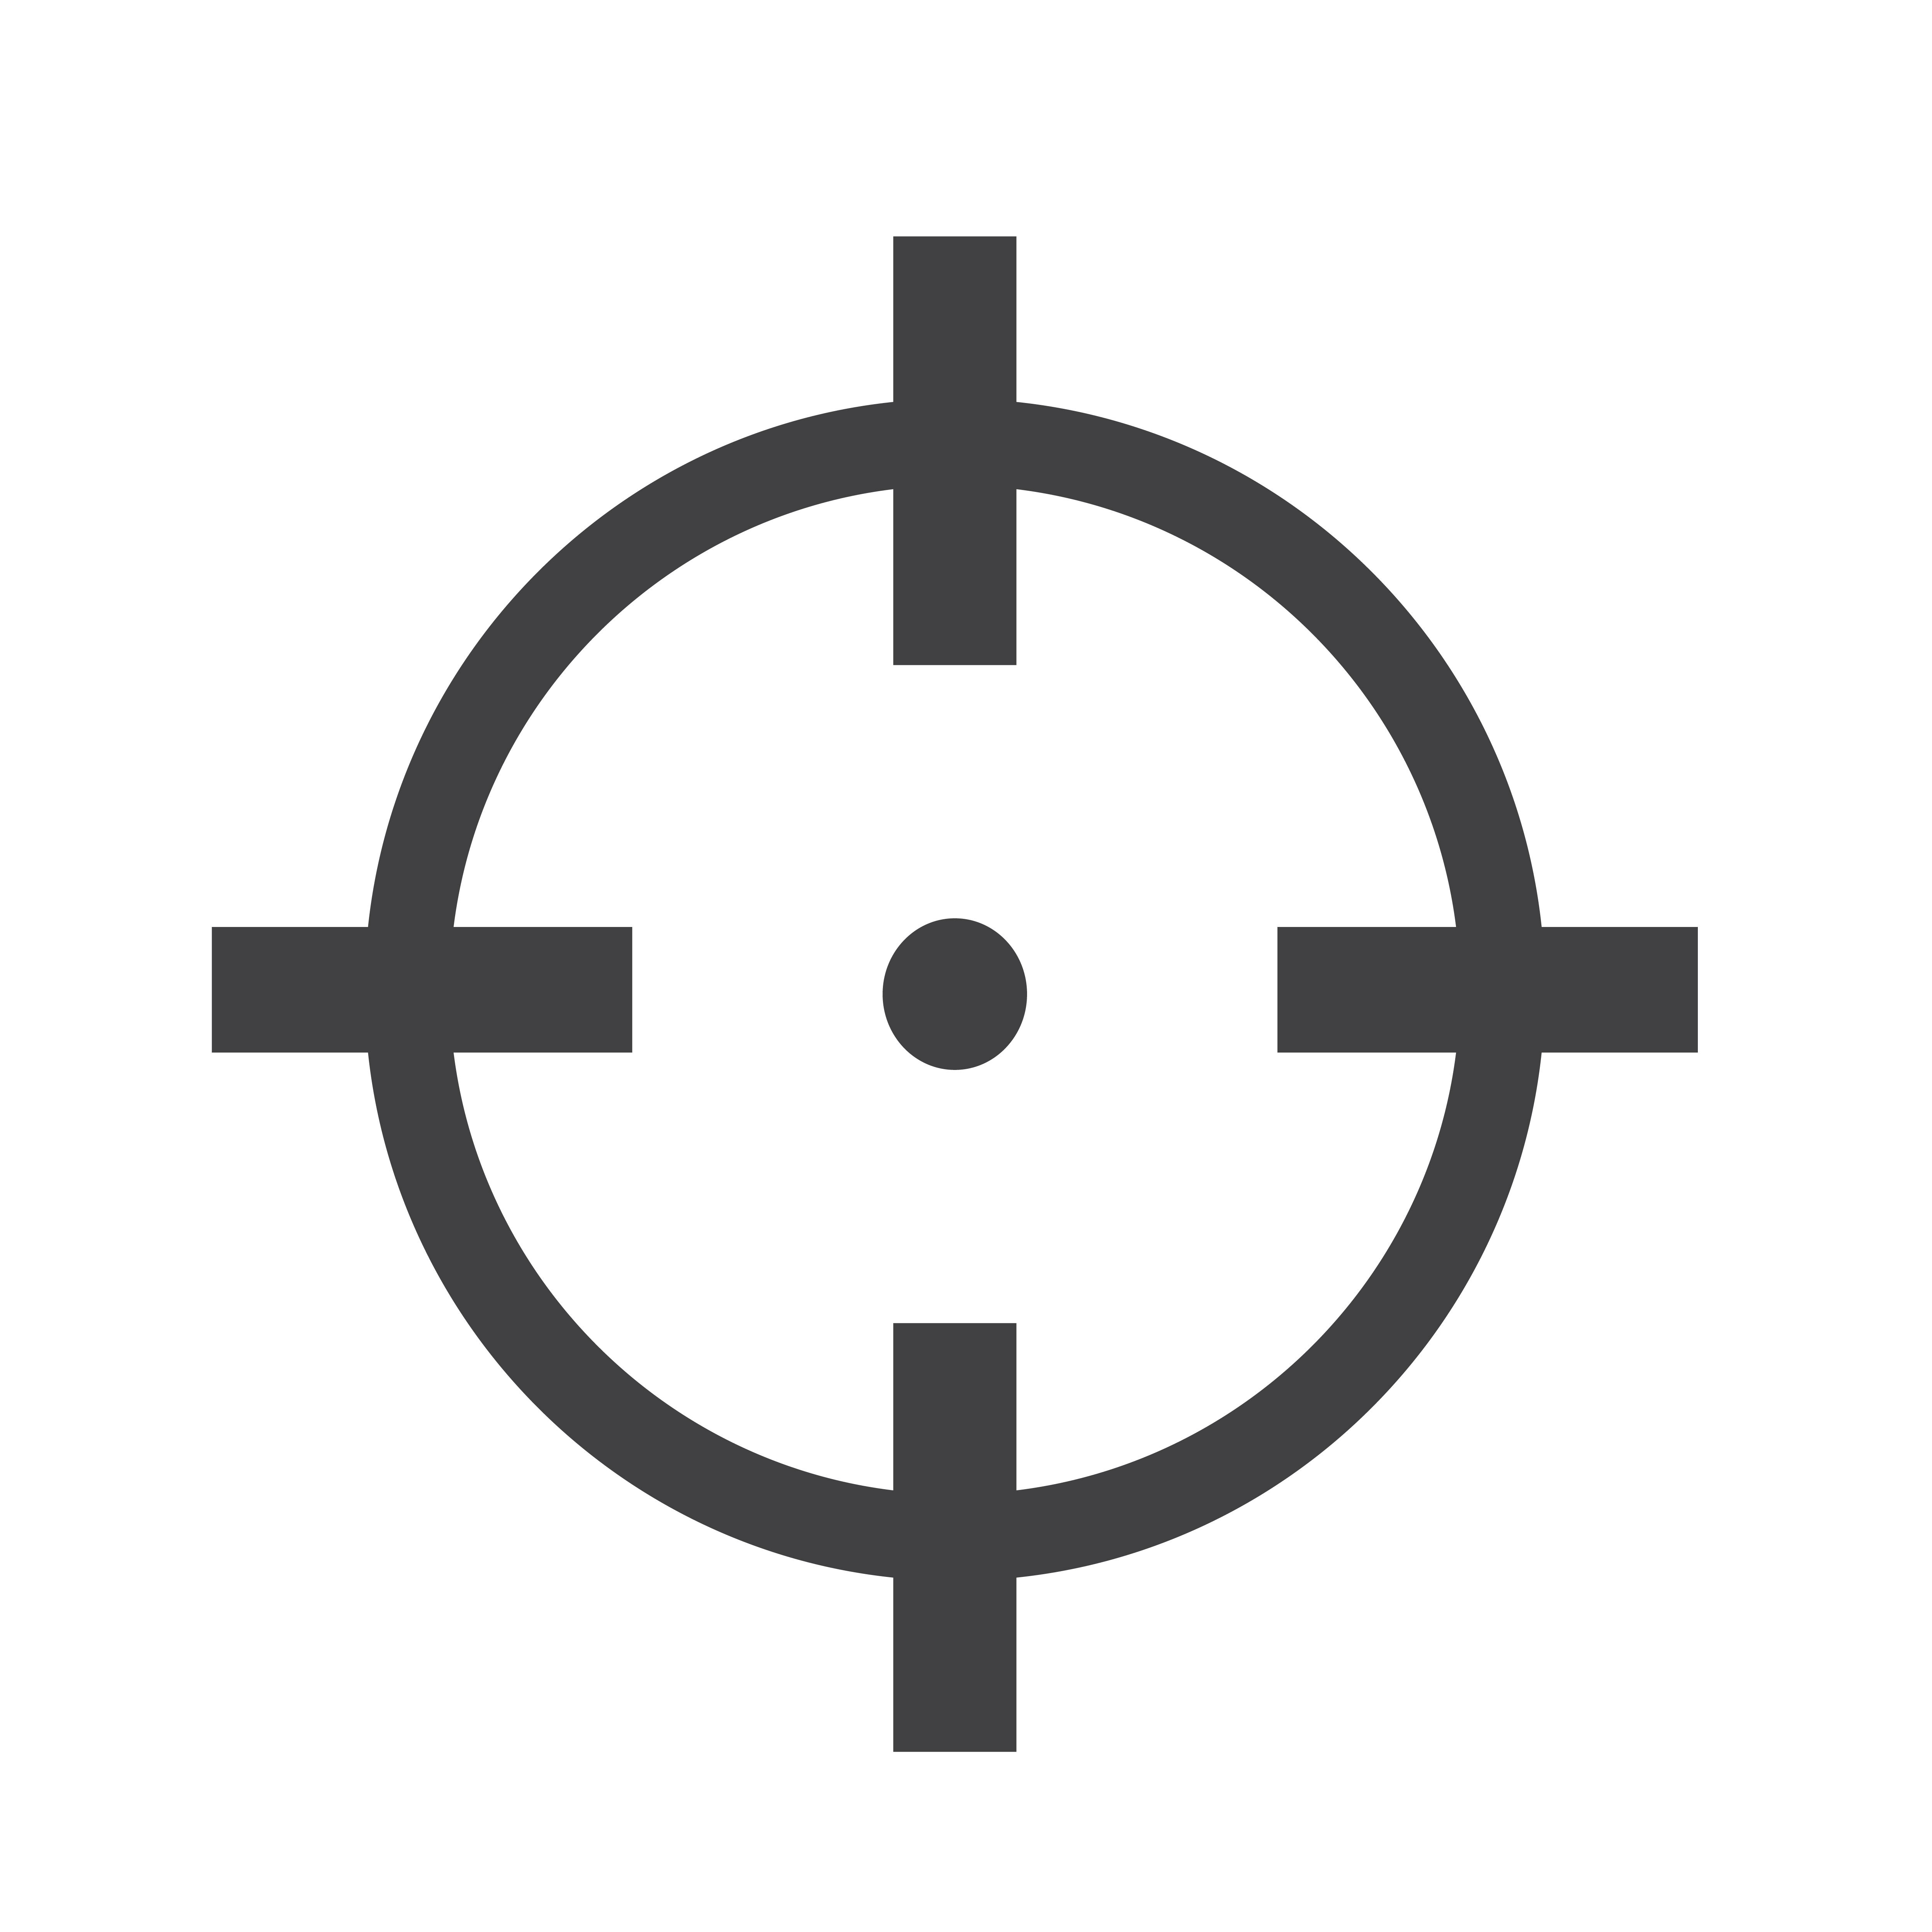 Target Icon Sign Illustration Download Free Vectors Clipart Graphics Vector Art We upload amazing new icon designs everyday! target icon sign illustration download free vectors clipart graphics vector art